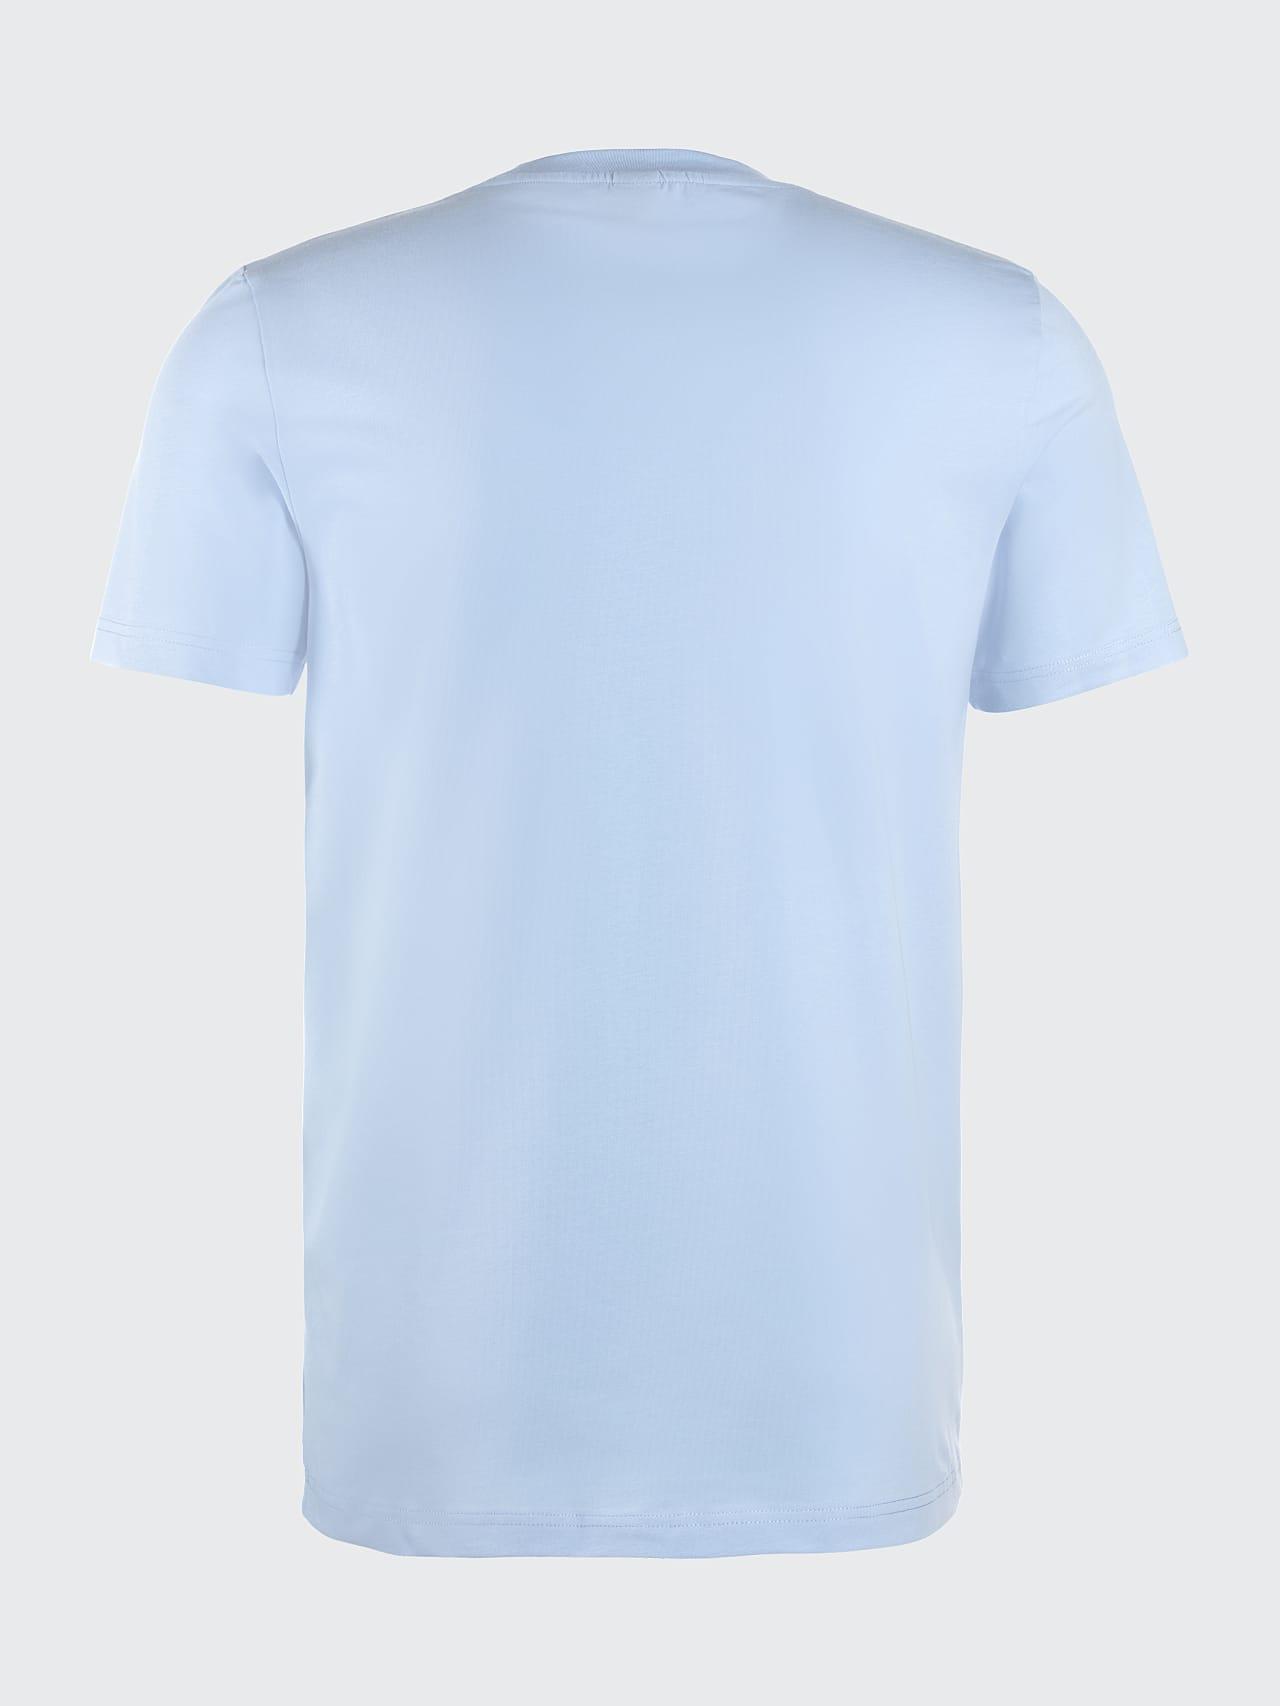 JERO V2.Y4.02 Signature Logo T-Shirt light blue Left Alpha Tauri